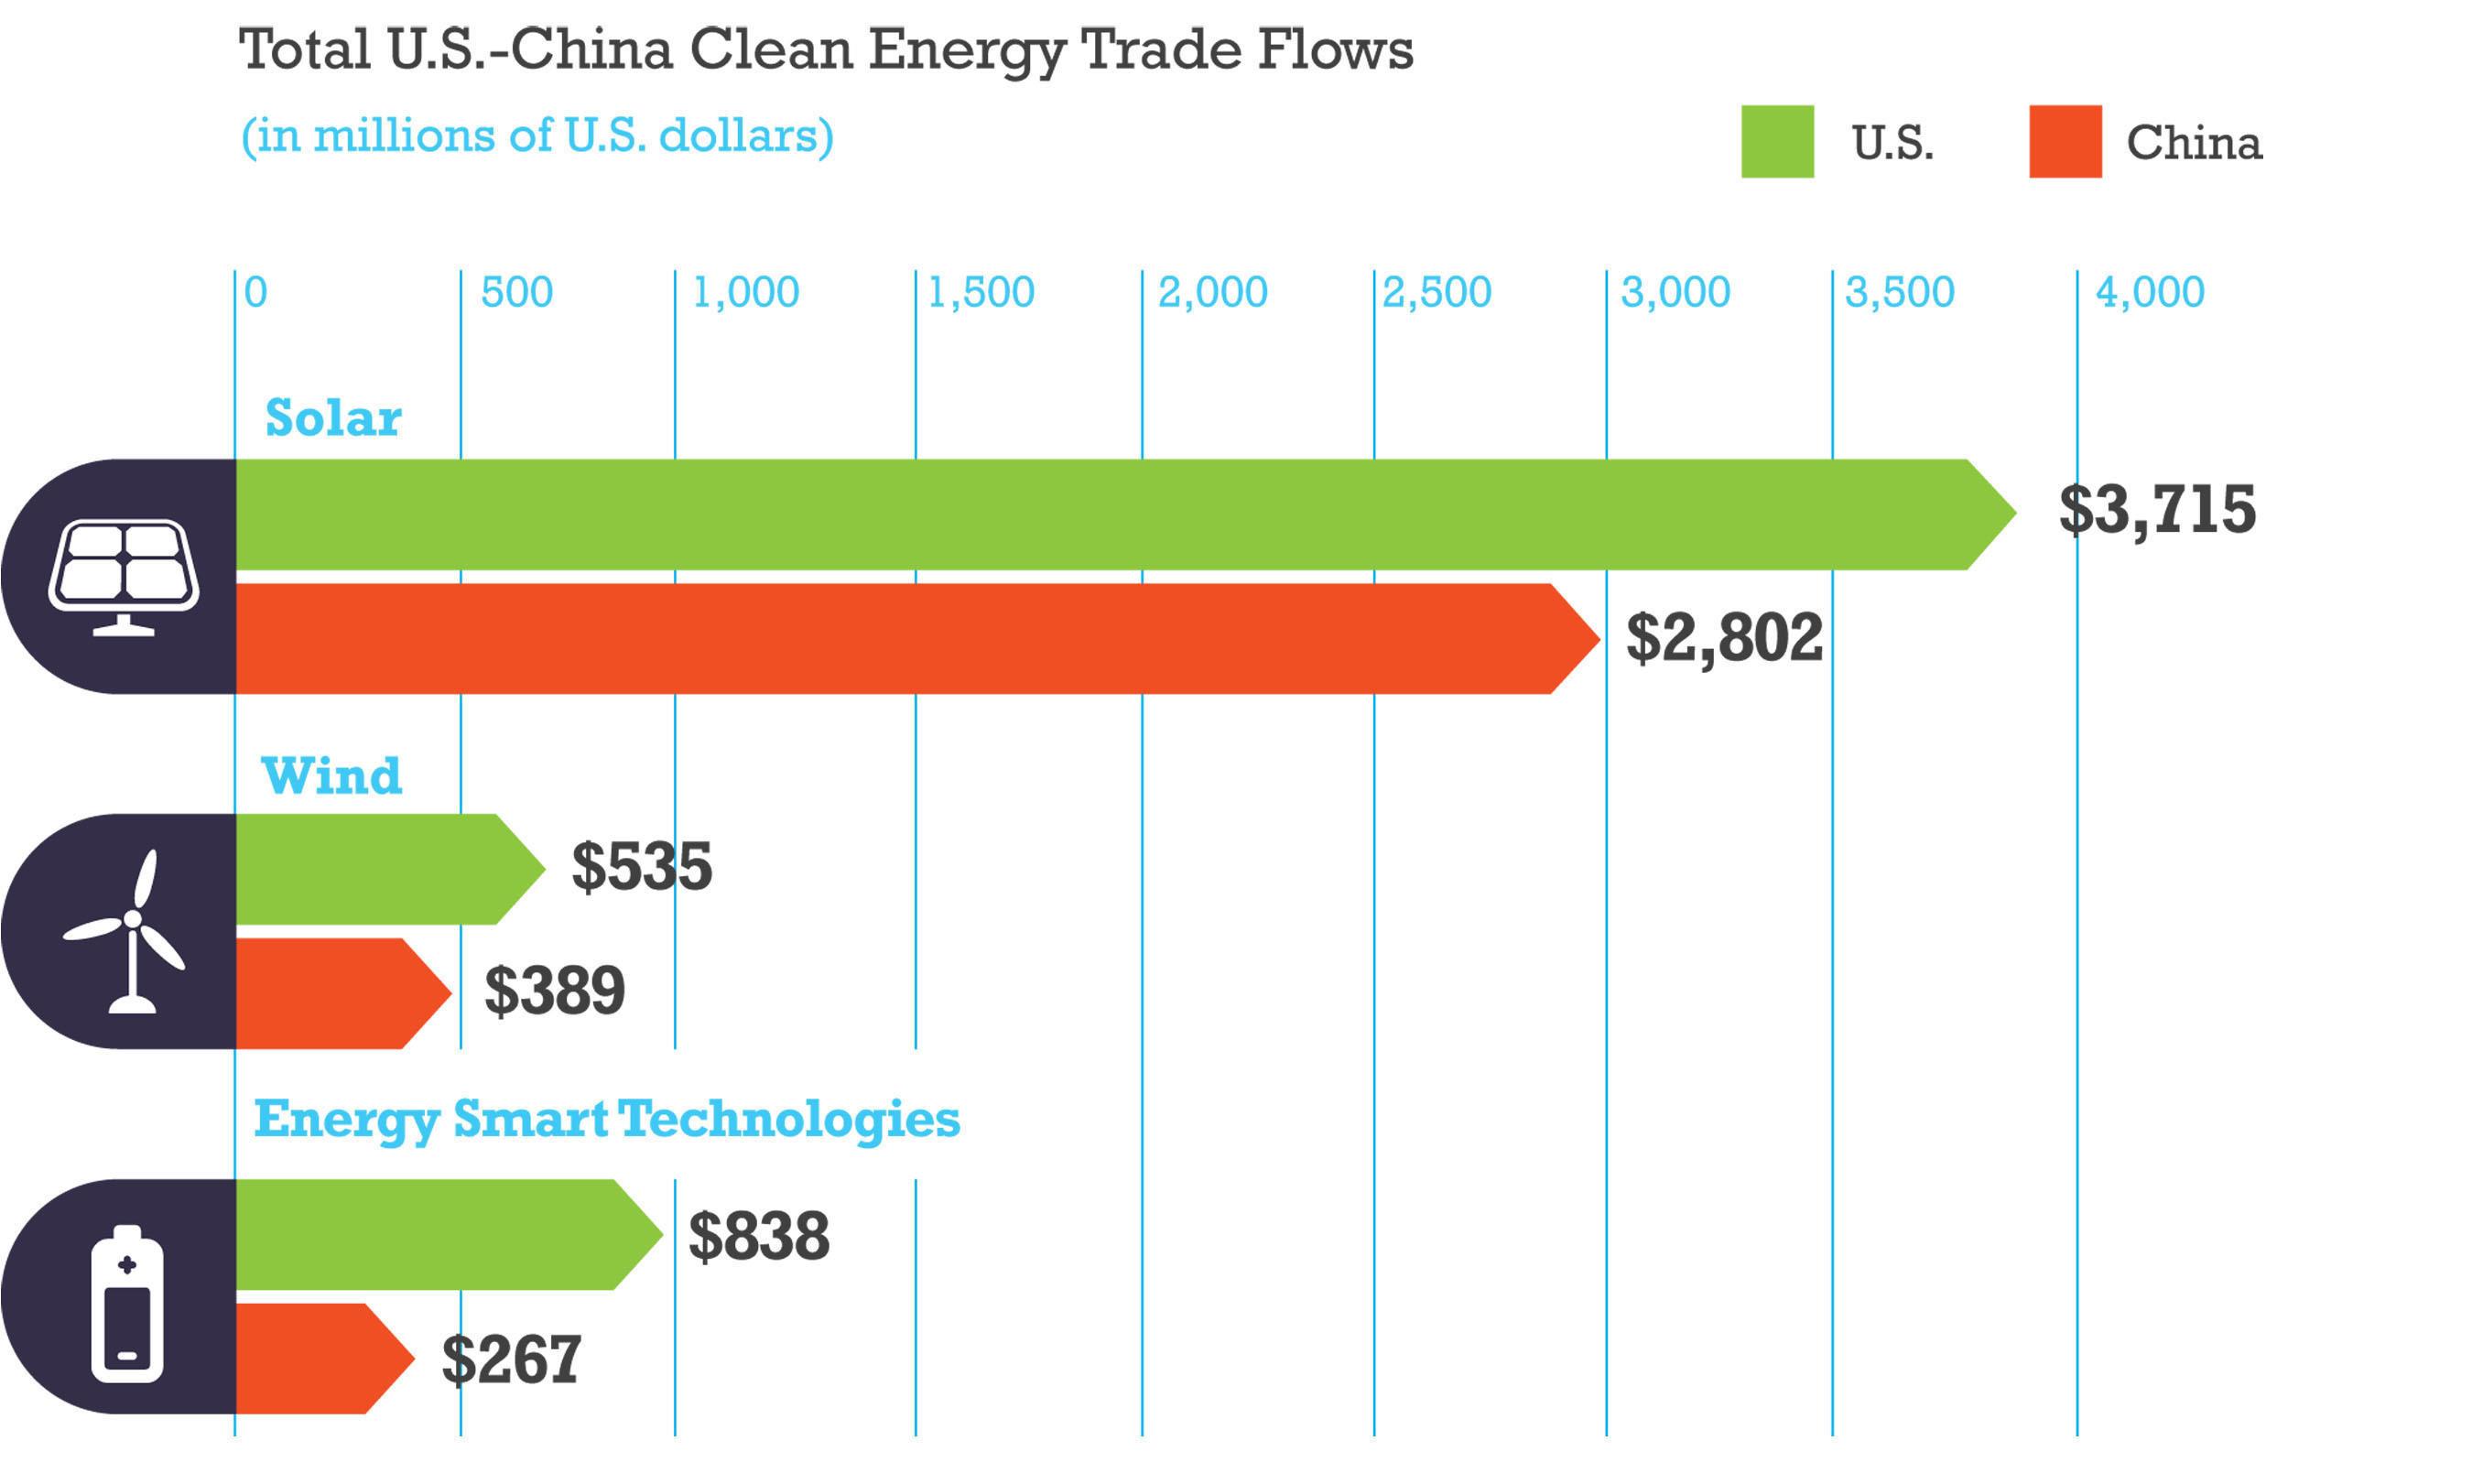 Advantage America:  Pew Report Finds That U.S. Companies Held $1.6 Billion Trade Surplus in Clean